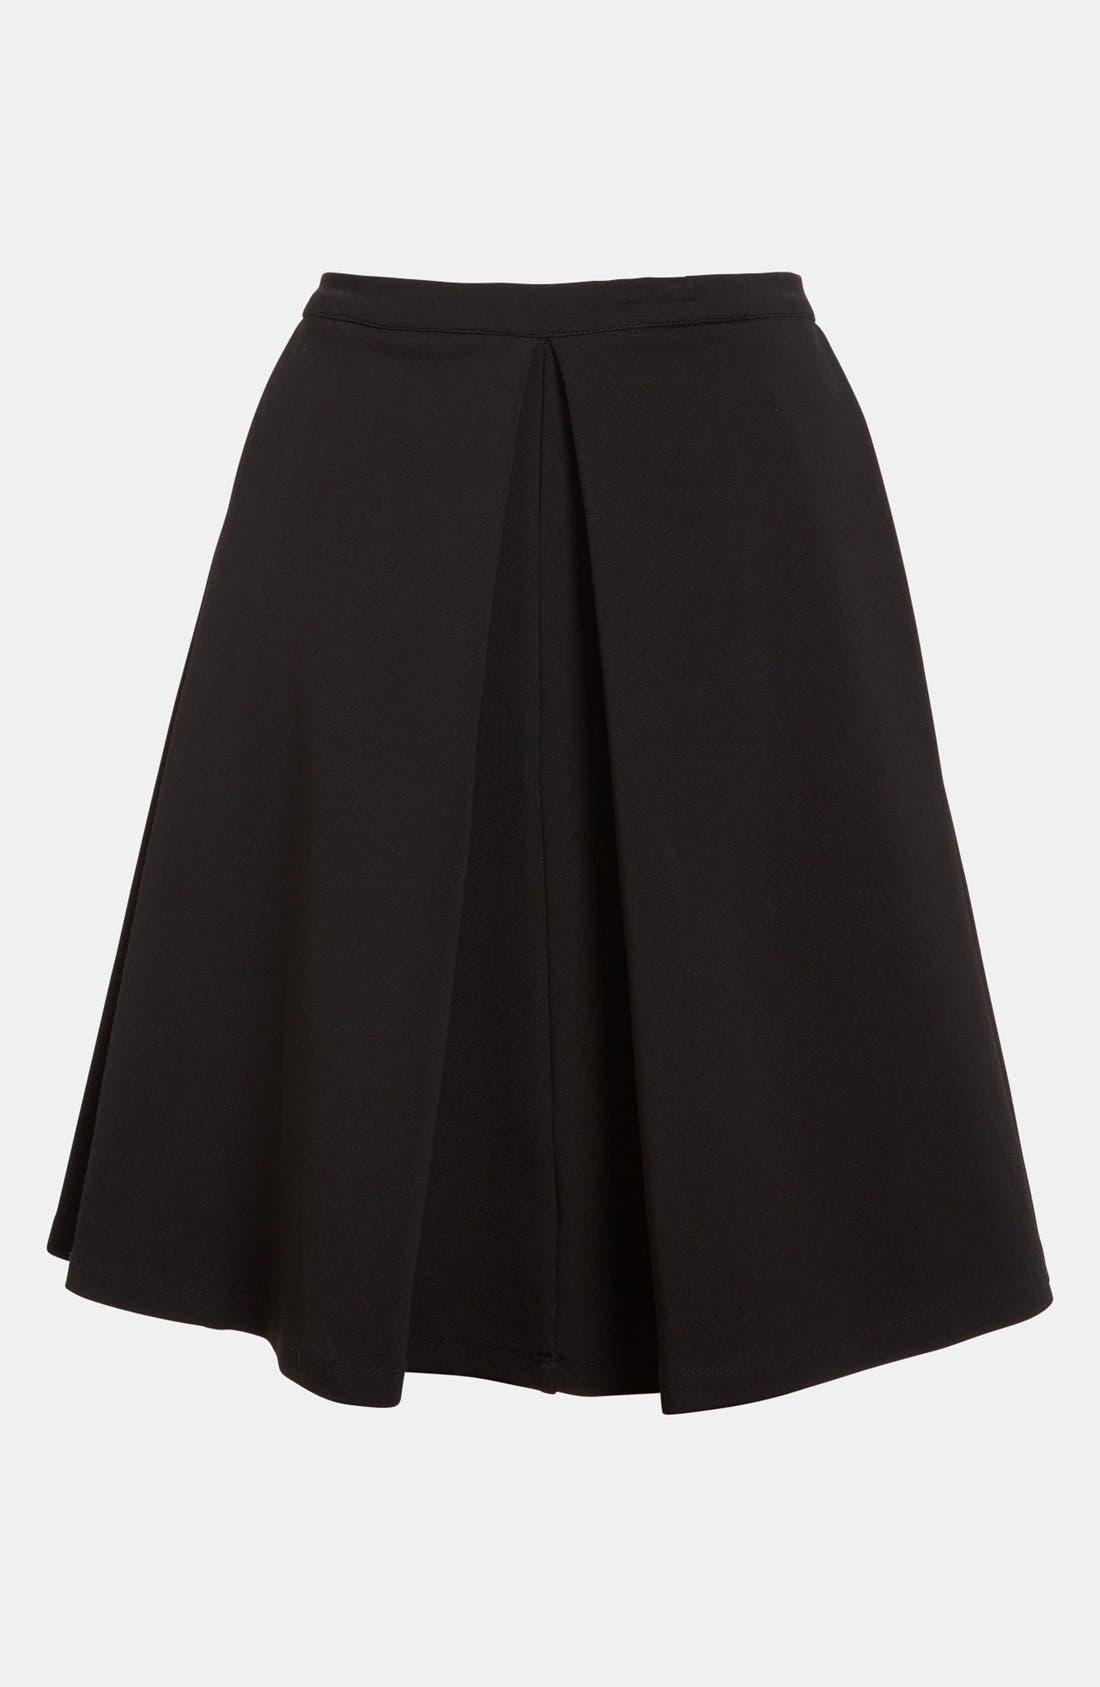 DEVLIN Pleated Skirt, Main, color, 001